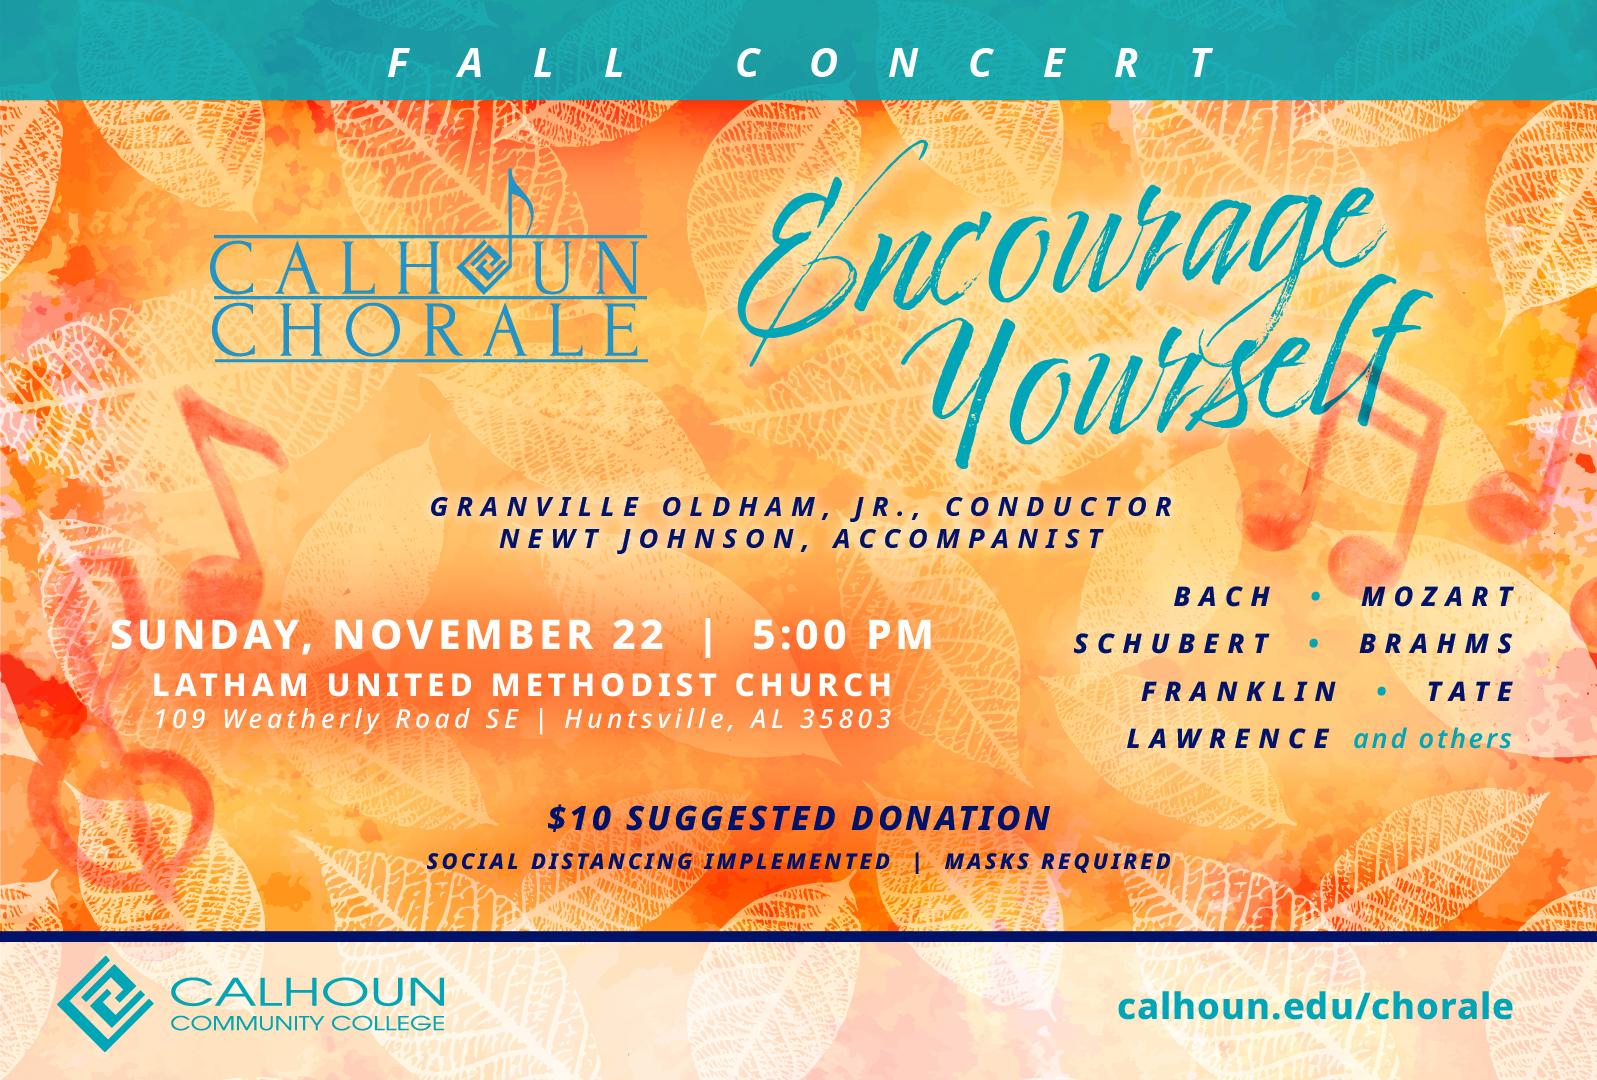 calhoun chorale graphic